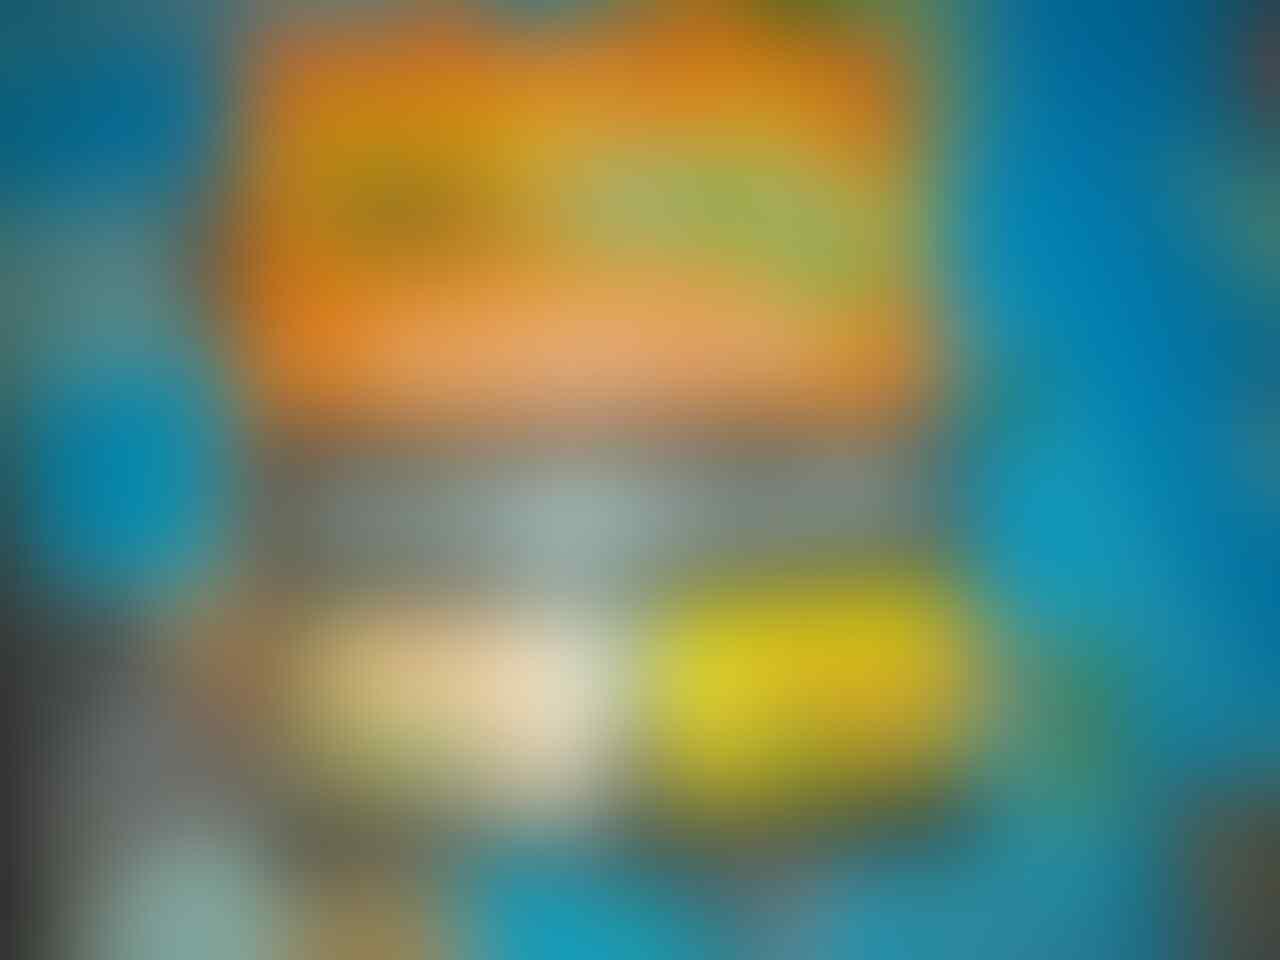 [FIELD REPORT] #CaraPinterGue Dapat Sejuta Kebahagian Bareng Kaksus Expert